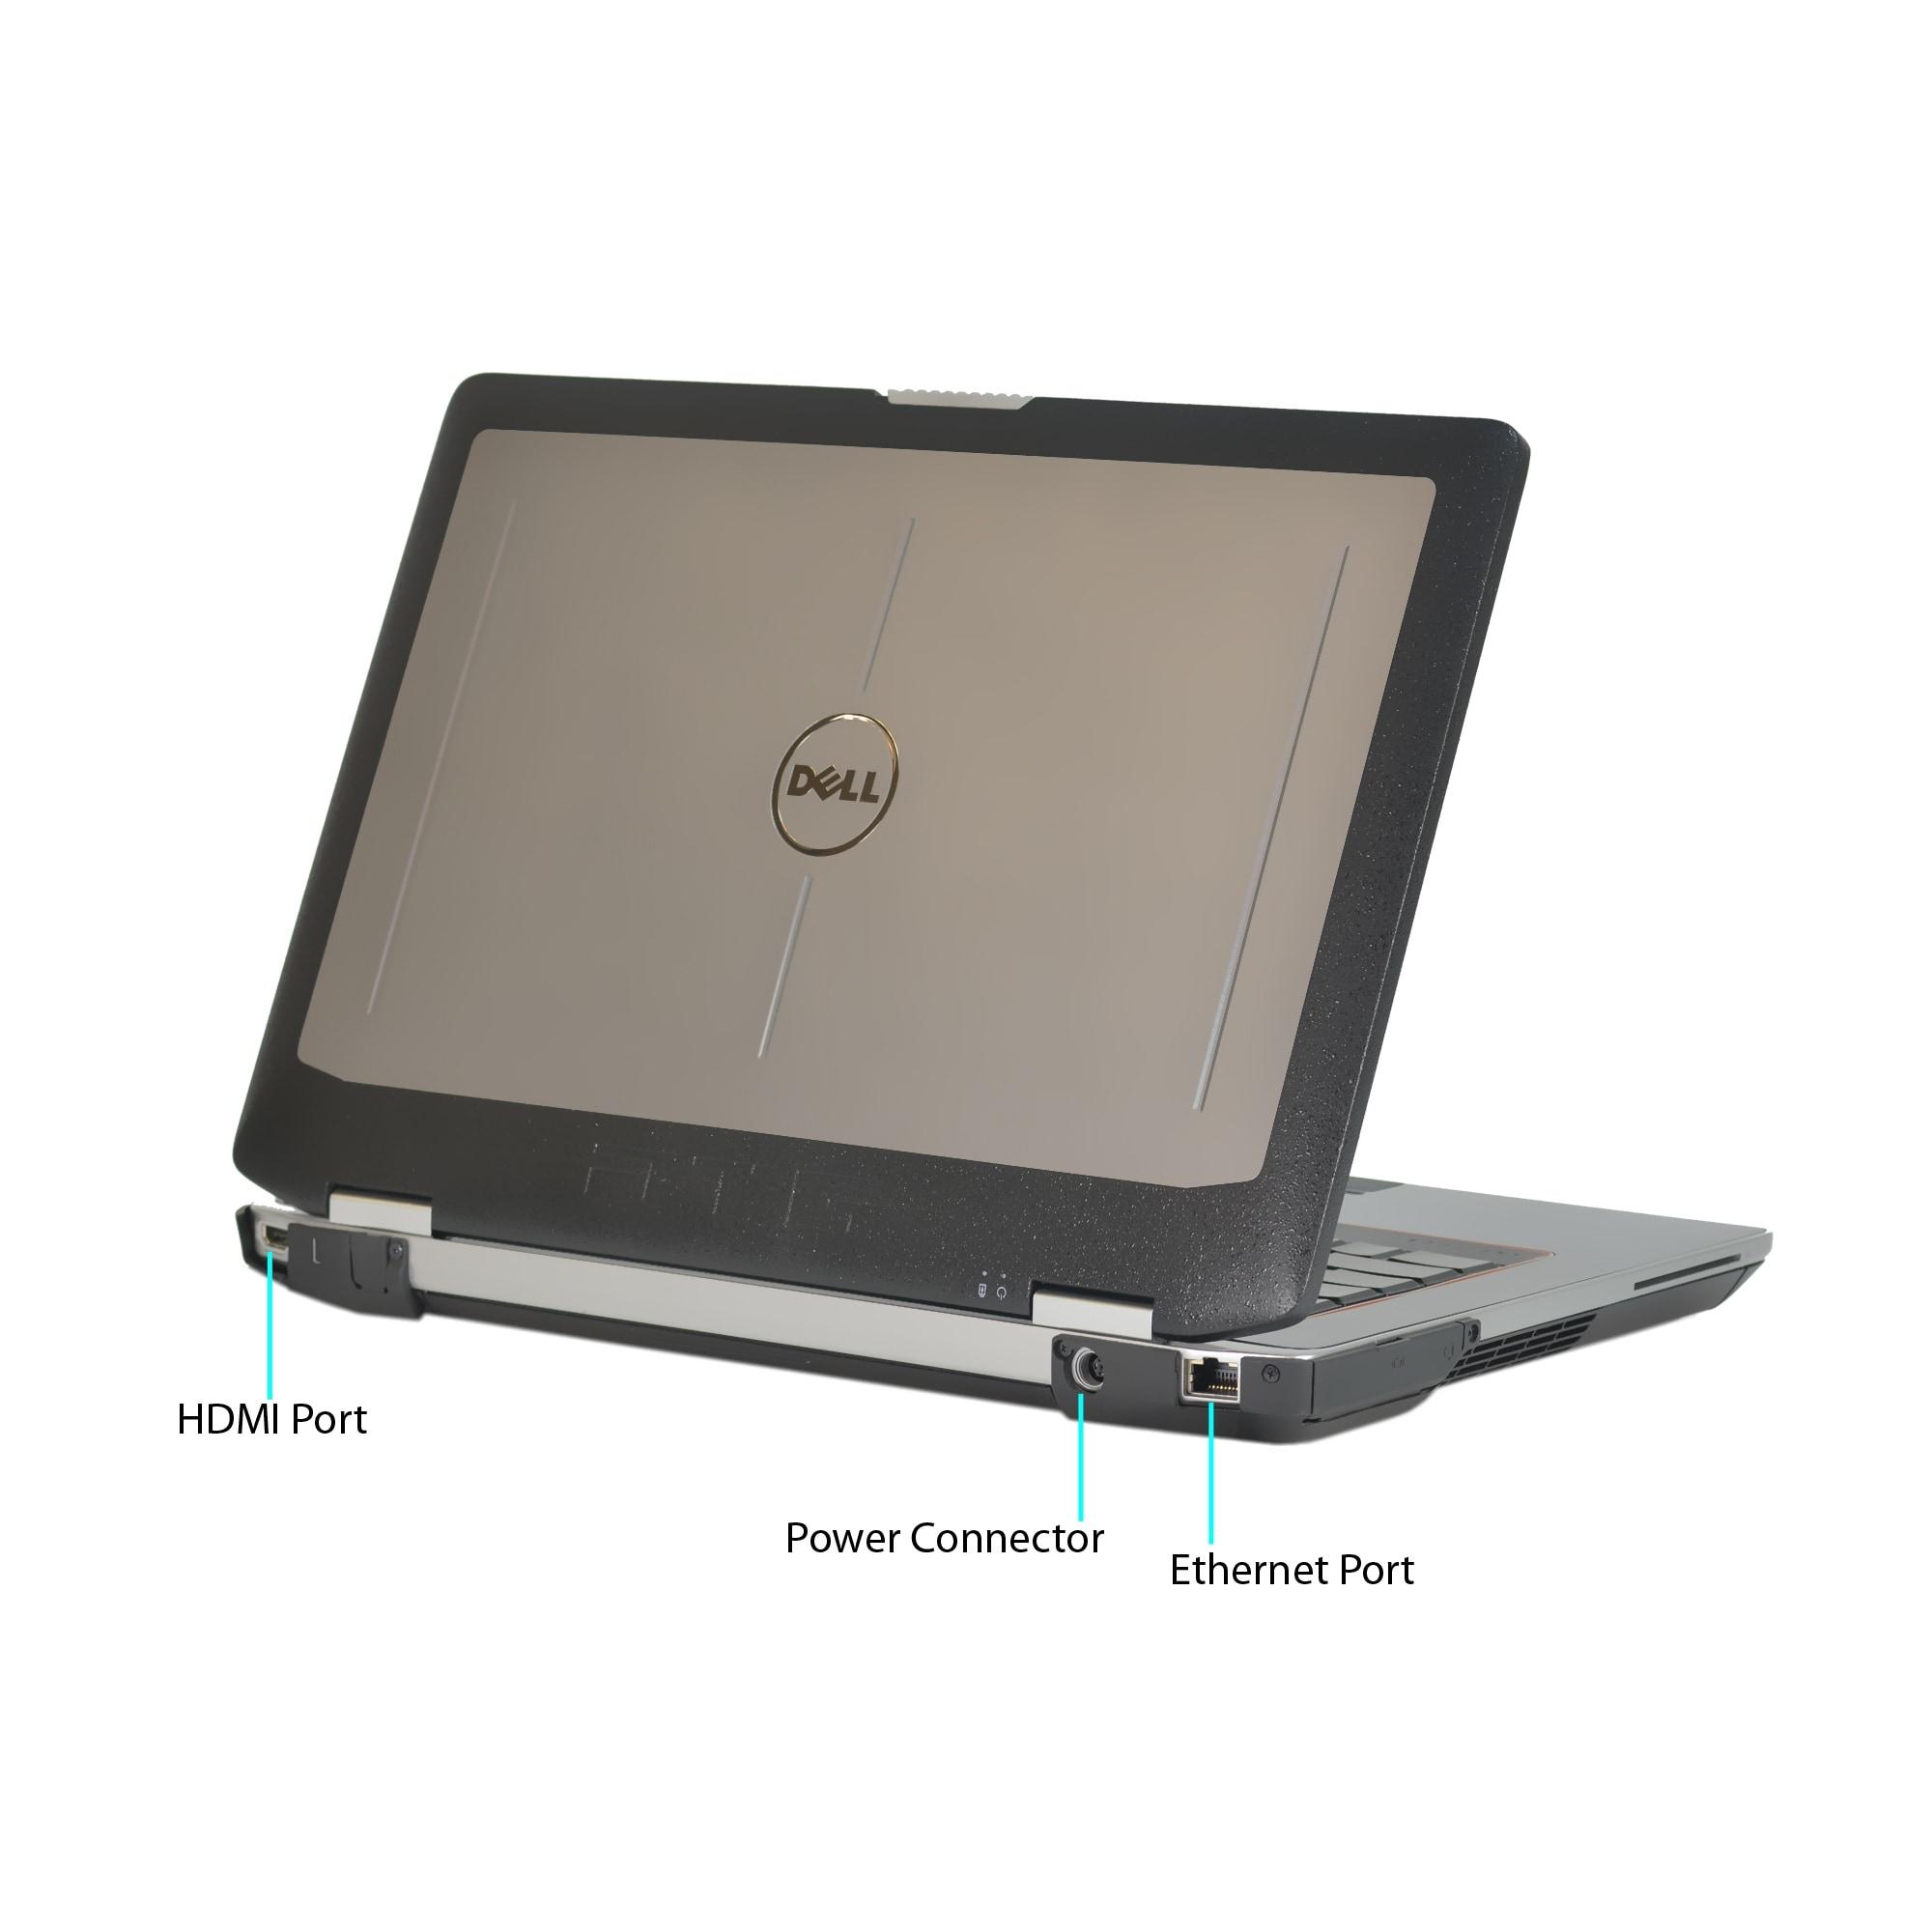 Dell Latitude E6430 ATG Intel Core i7-3520M 2 9GHz 3rd Gen CPU 6GB RAM  256GB SSD Windows 10 Pro 14-inch Laptop (Refurbished)